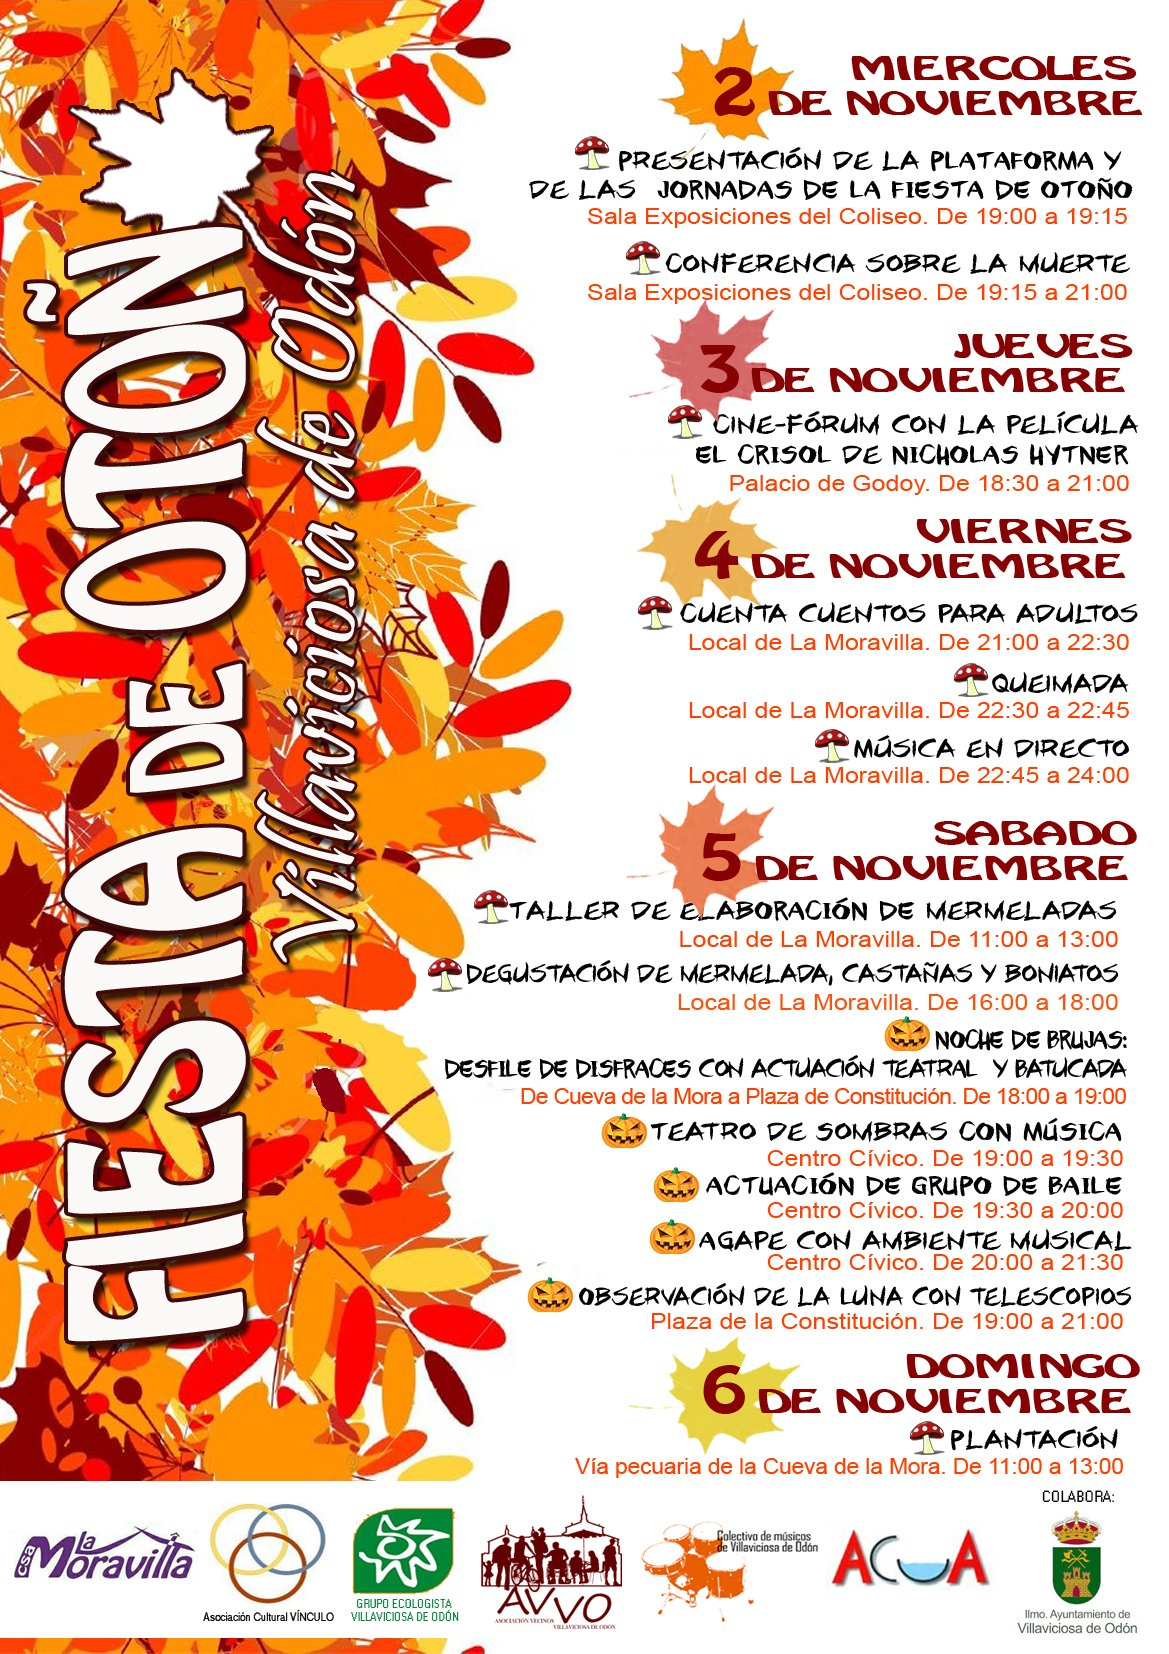 fiesta-otoño-villaviciosa-odon